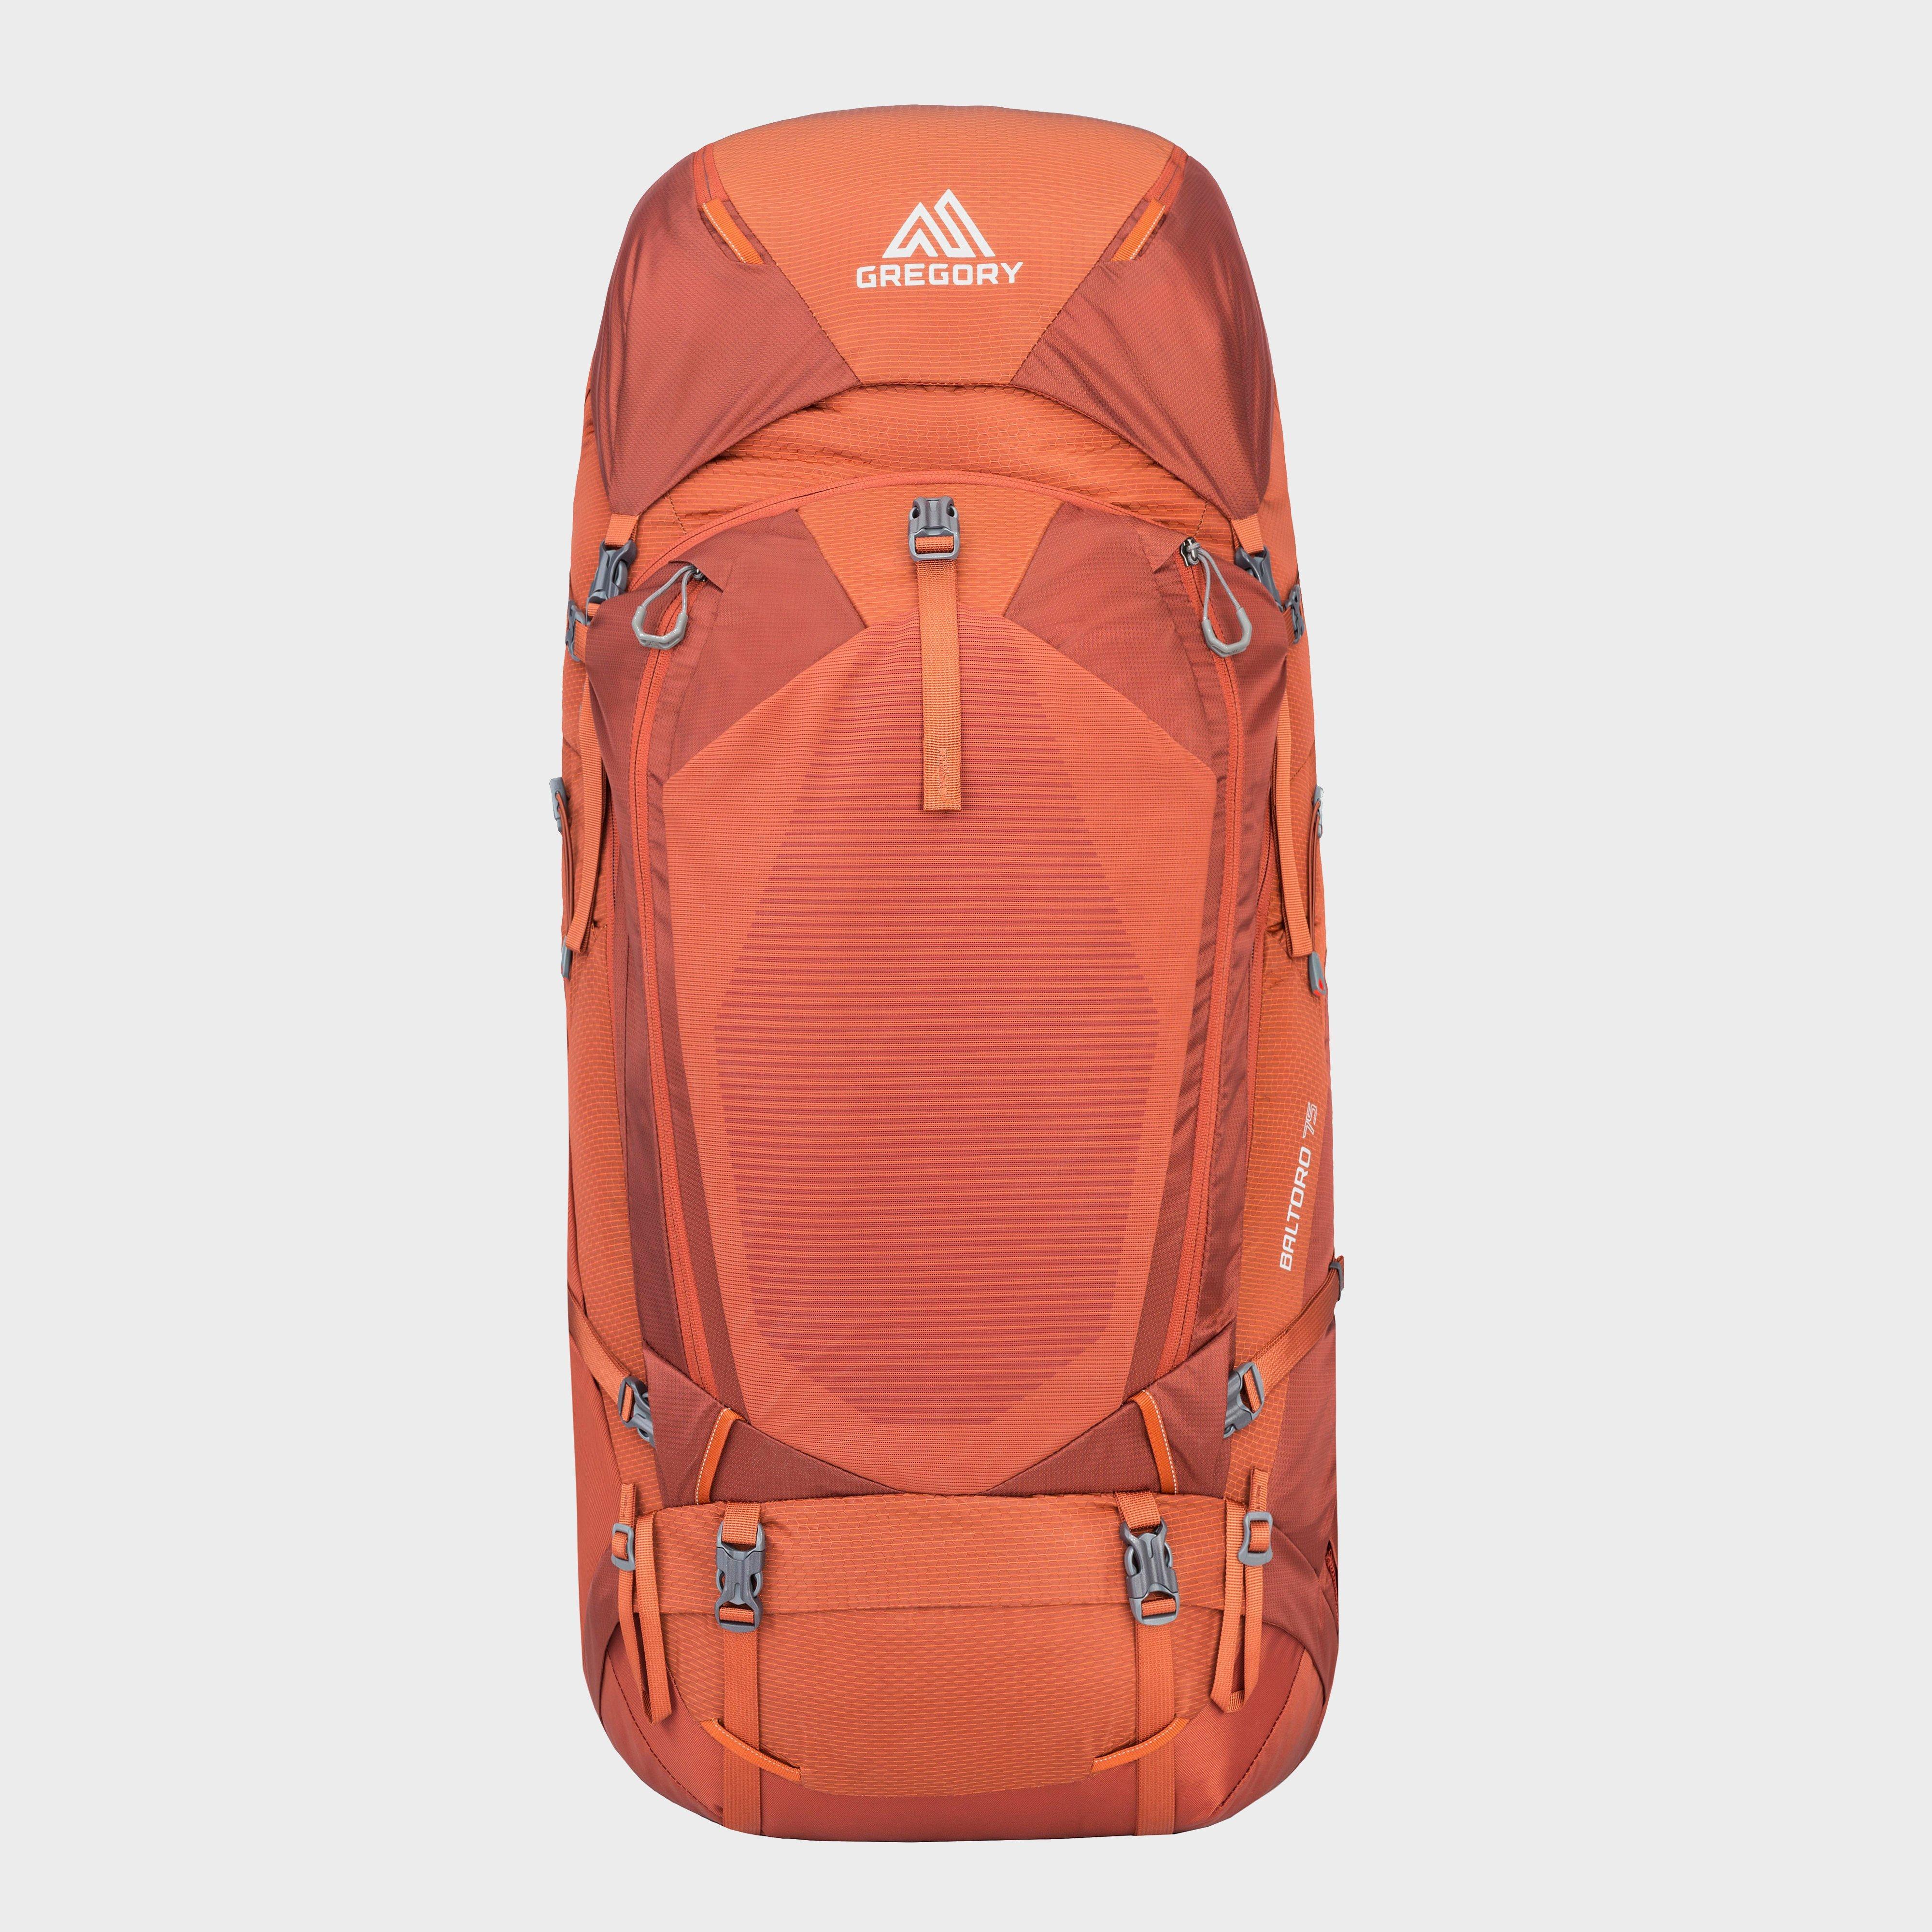 Gregory Baltoro 75 Backpack, Orange